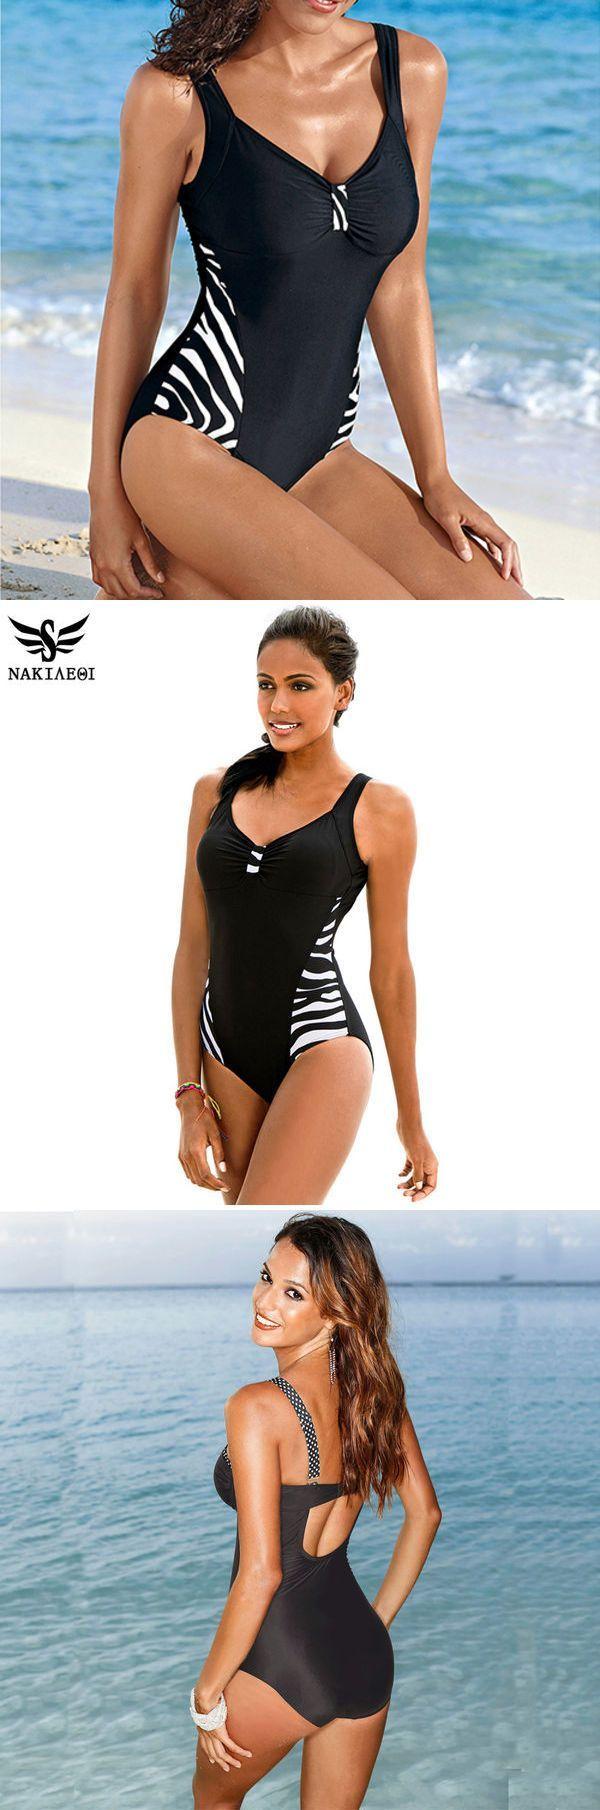 2465068b301 NAKIAEOI 2018 Newest One Piece Swimsuit Women Bathing Suits Vintage Summer  Beach Wear Swim Suit Stripe Plus Size Swimwear 5XL  swimwear  swimsuit   swimsuits ...